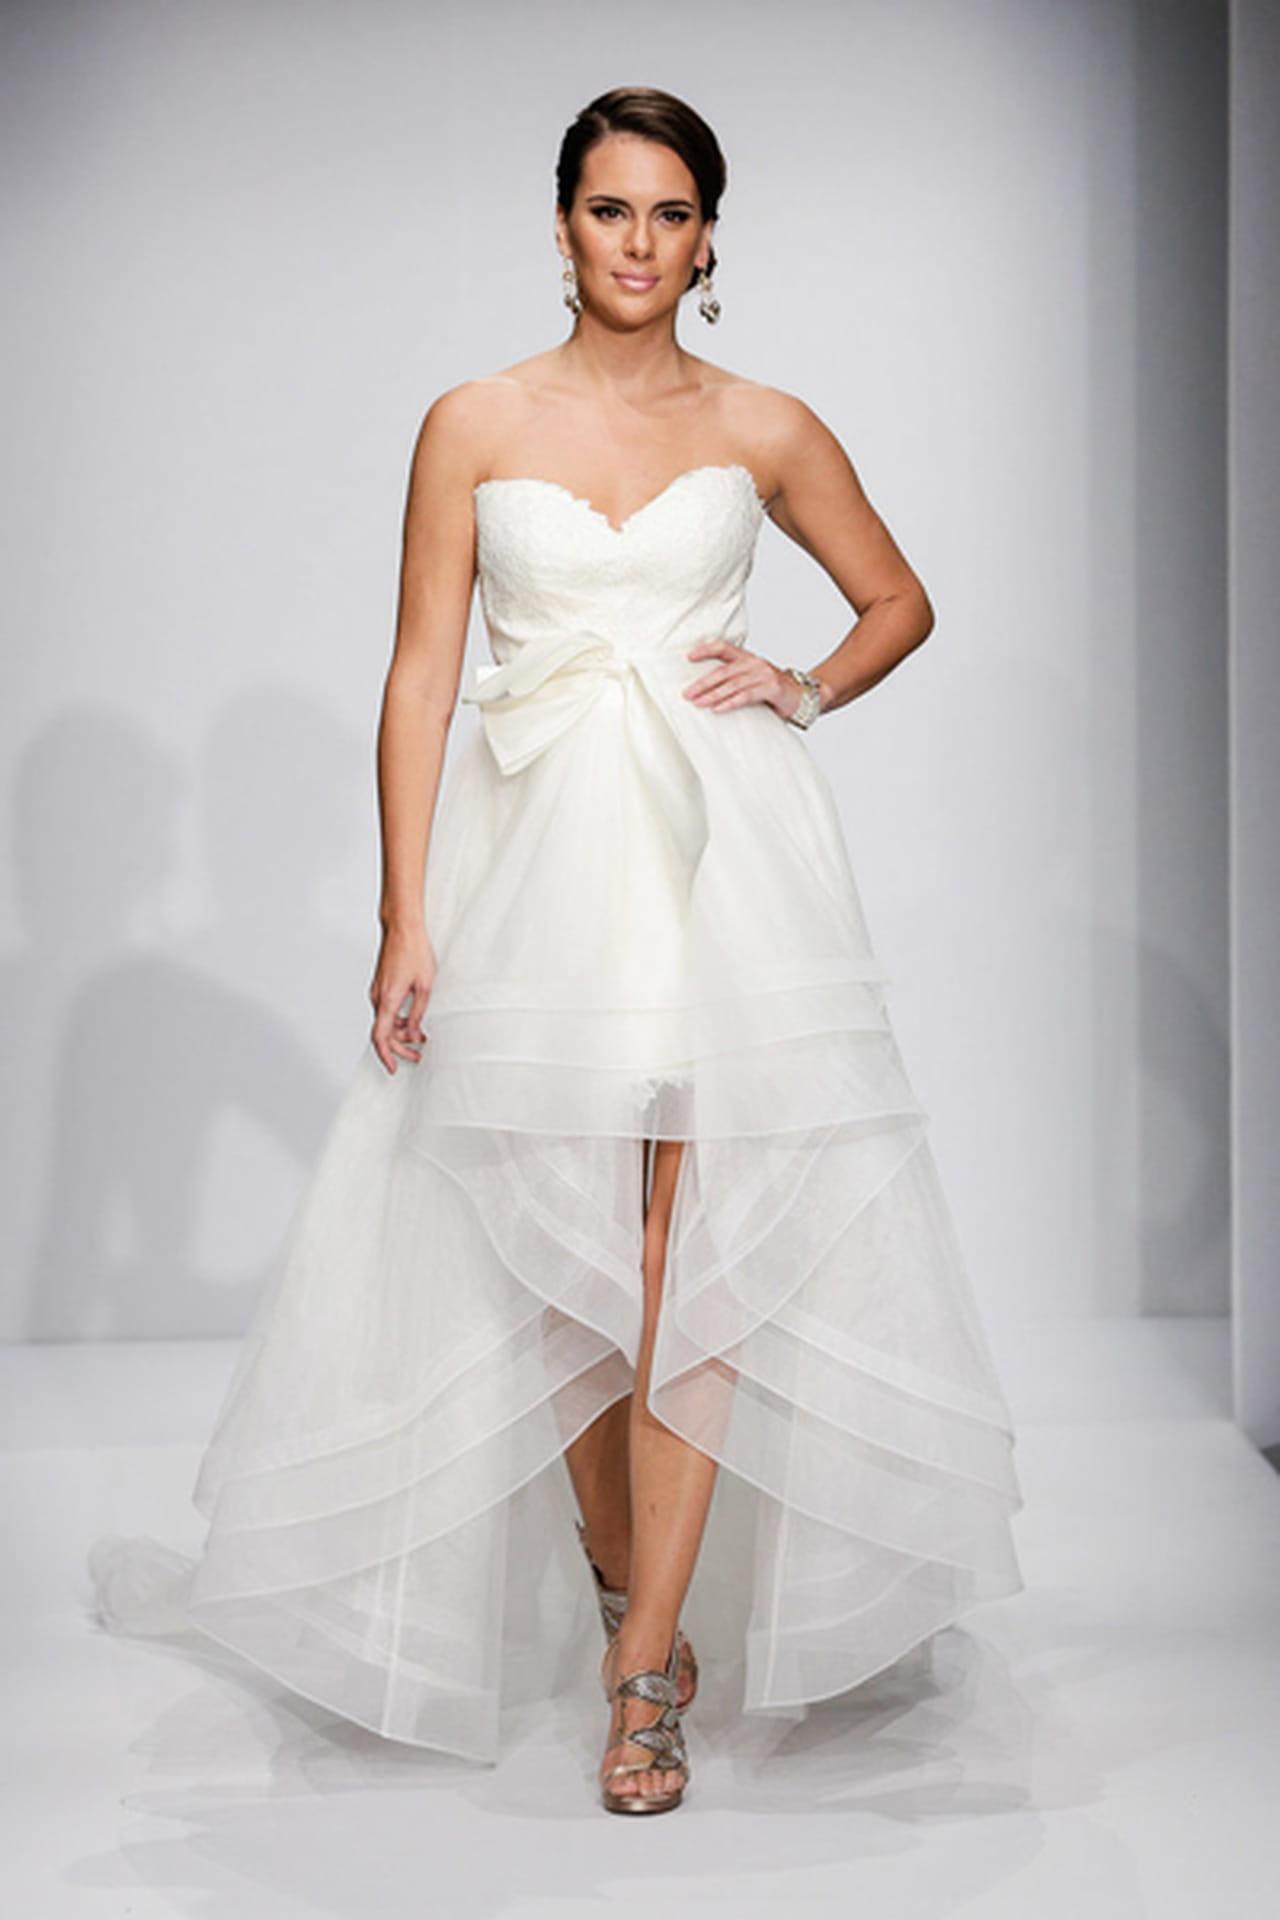 2e18e273d تصاميم مذهلة للفساتين القصيرة لعروس فاتنة! الفستان من Matthew Christopher.